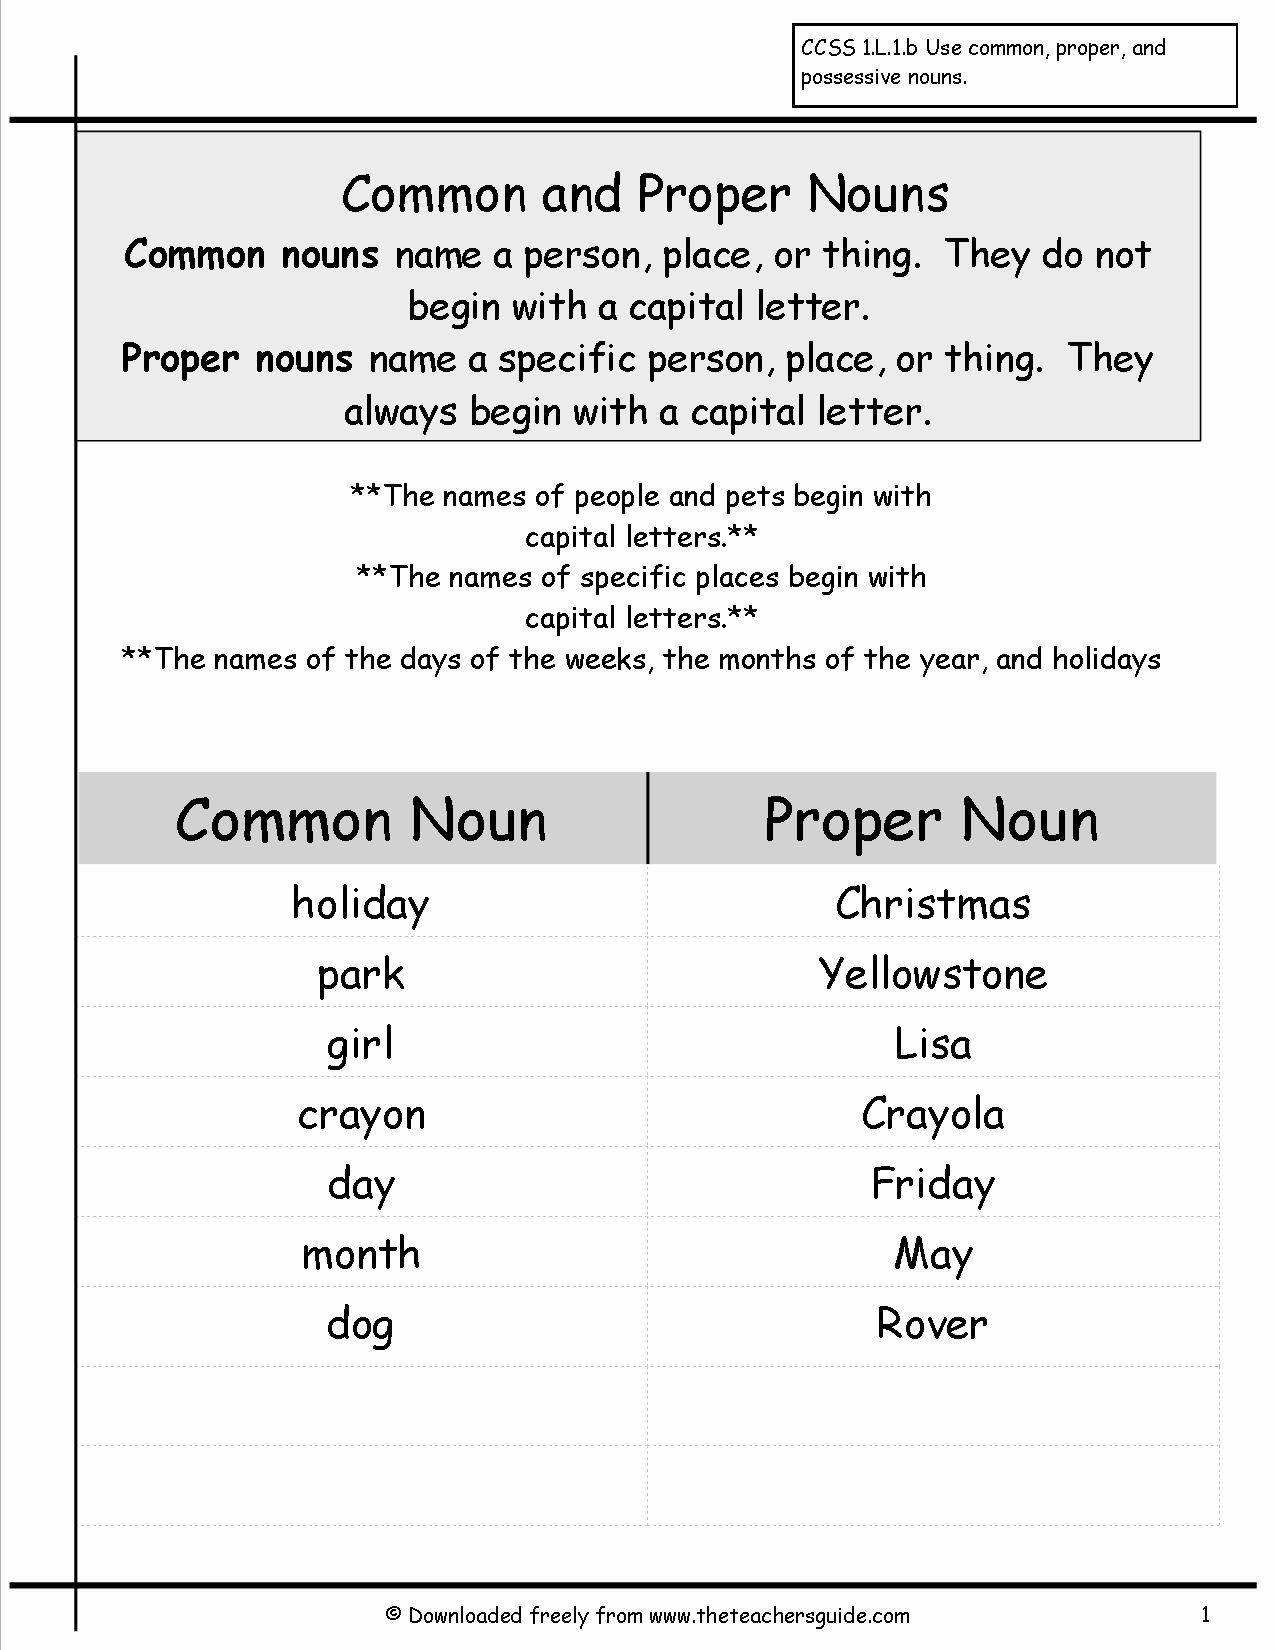 50 Proper Nouns Worksheet 2nd Grade